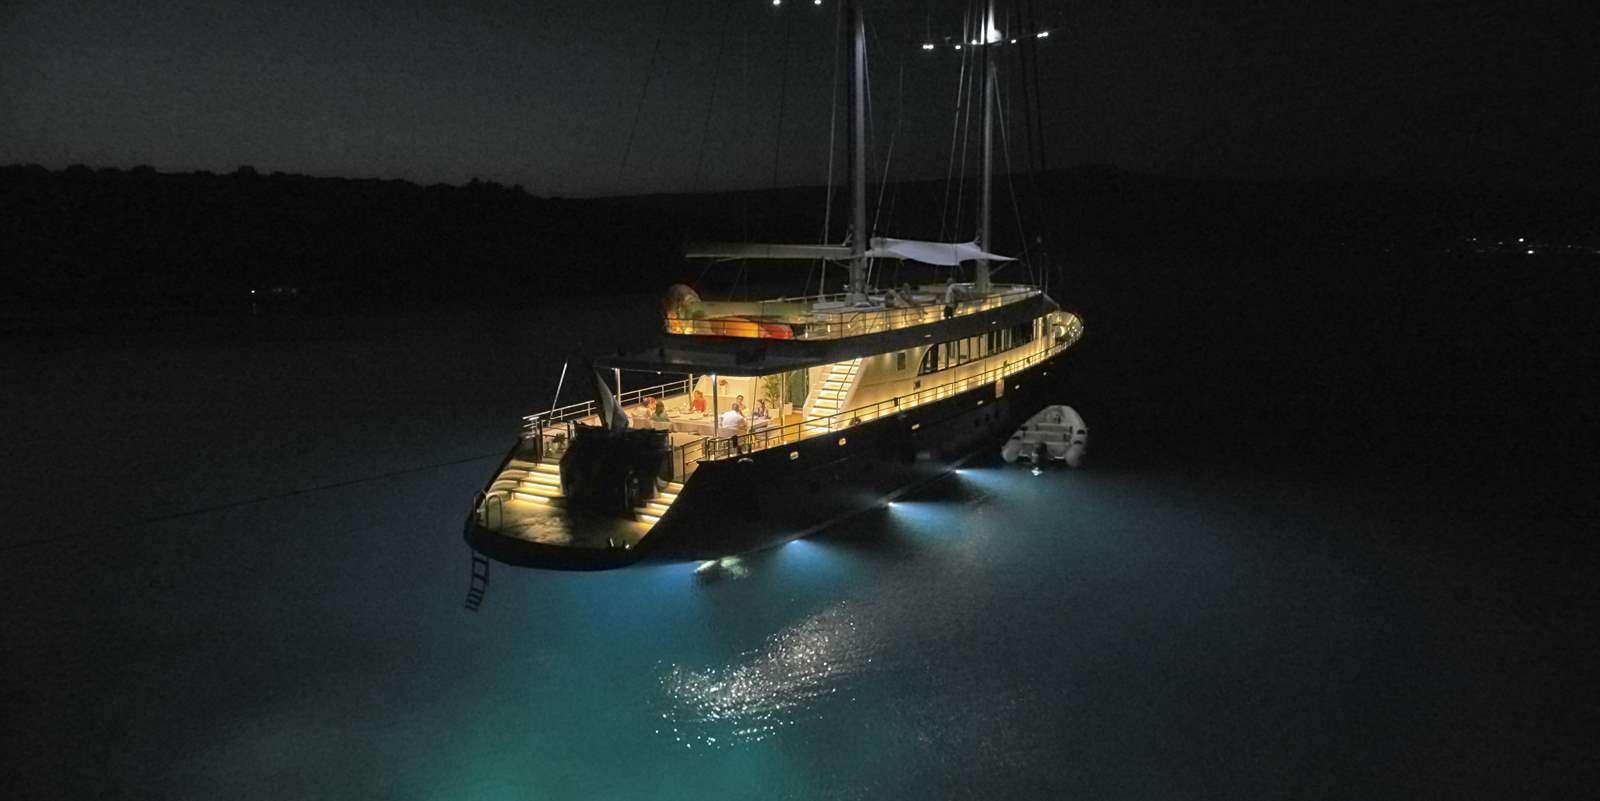 Image of Dalmatino yacht #12